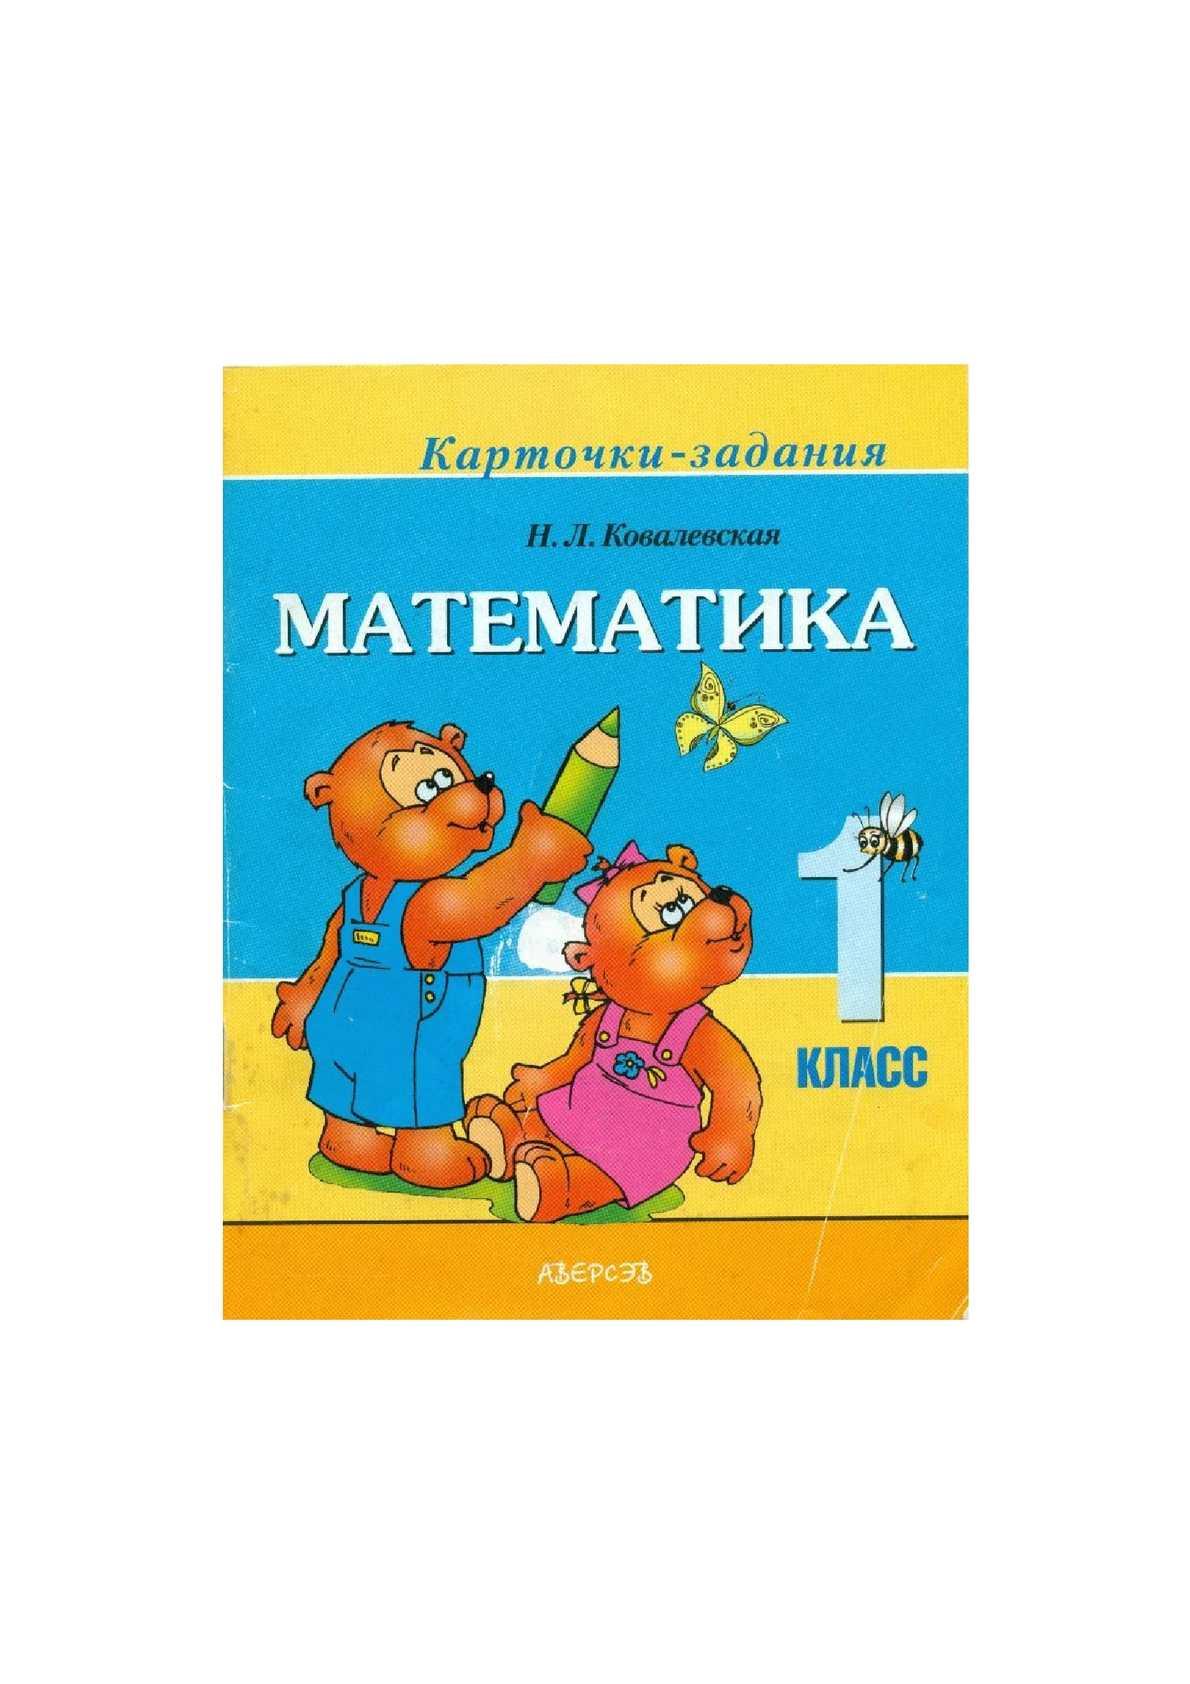 Математика 1 класс Карточки задания